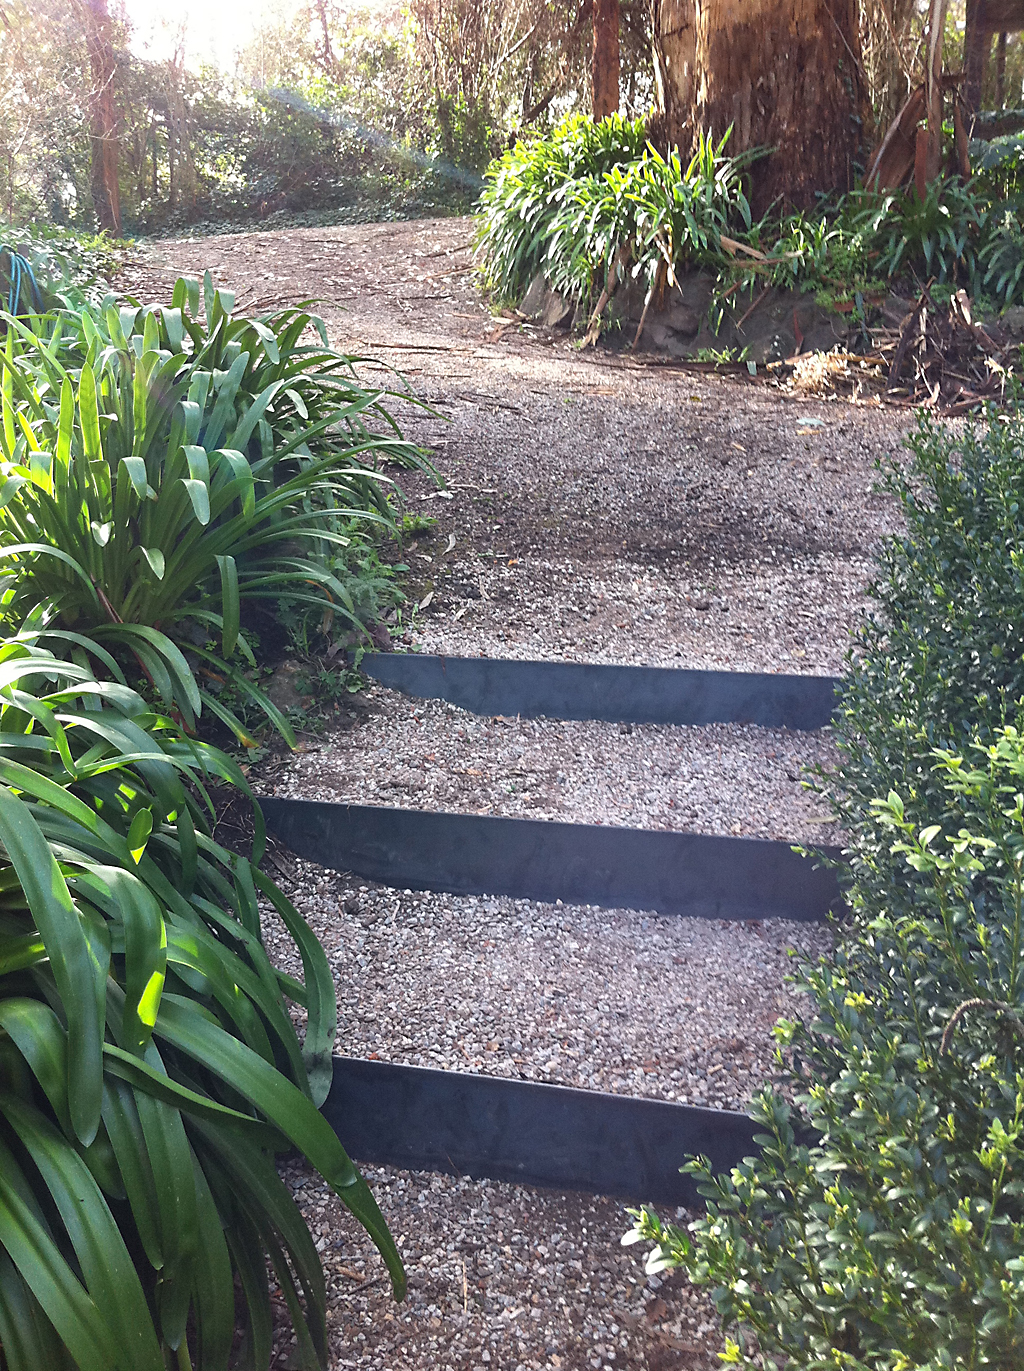 creative_garden_beds_and_steps_in_any_shape_you_desire3 - garden edging   Metal Garden Edging   lawn edging   landscape edging    garden design